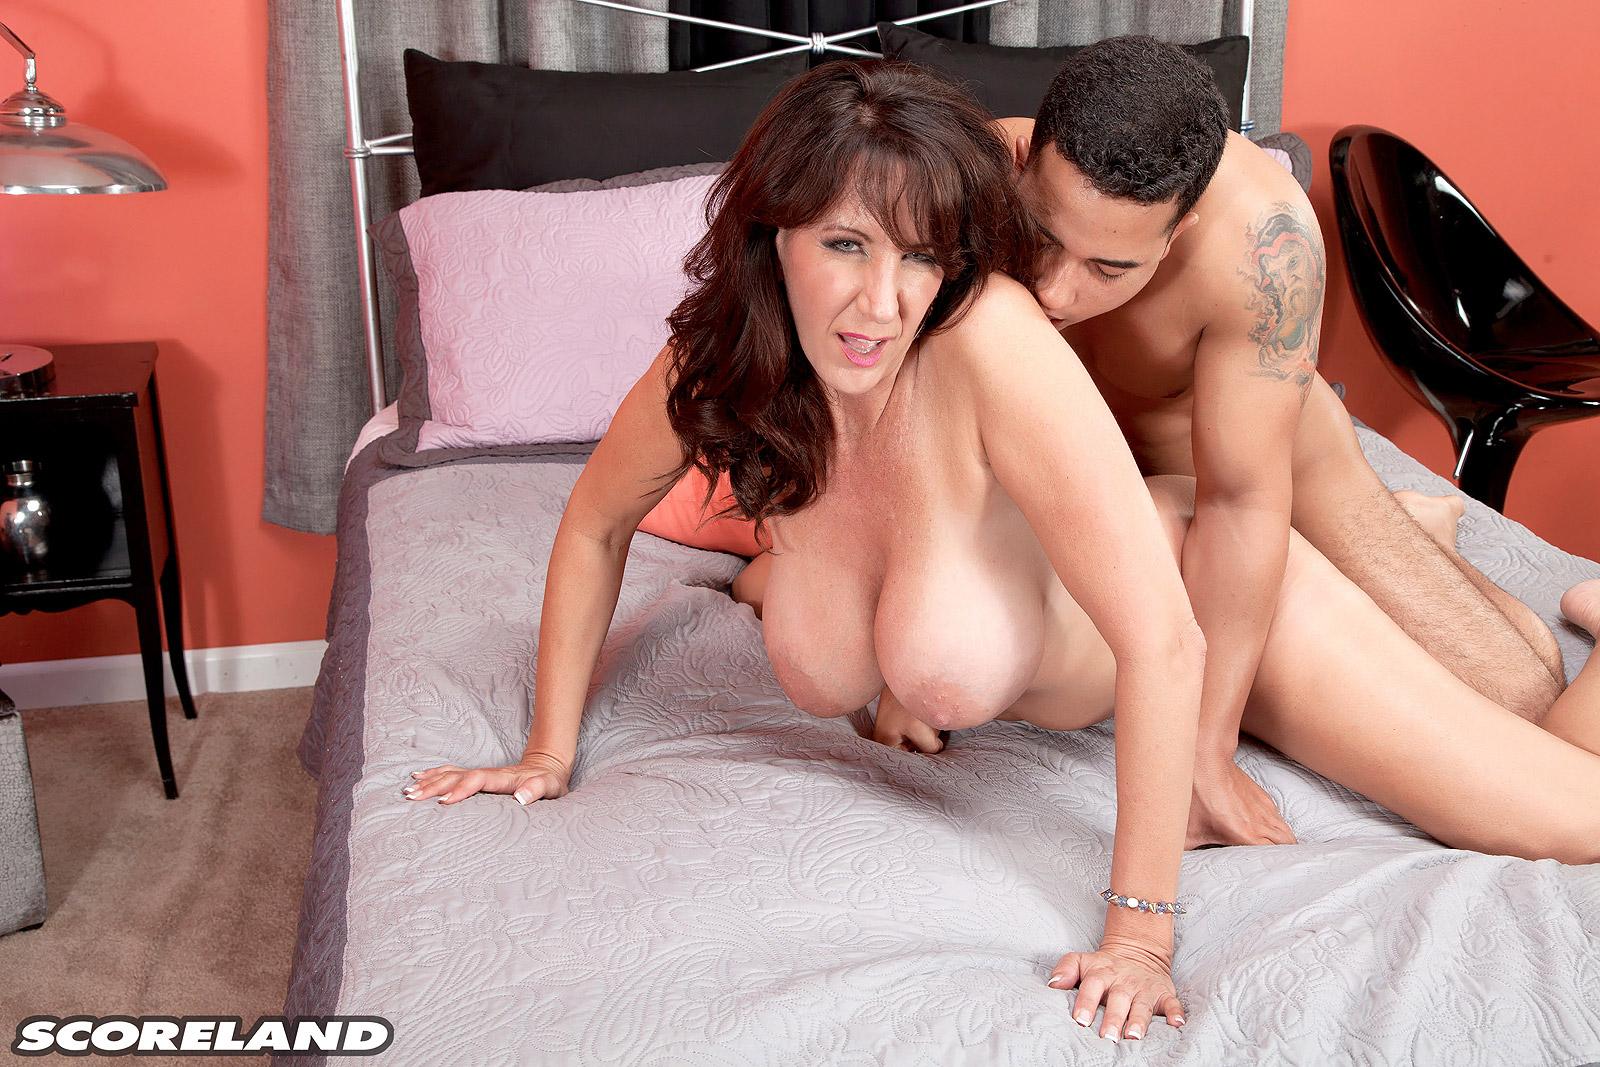 Brandi love seduced by a cougar porn galleries